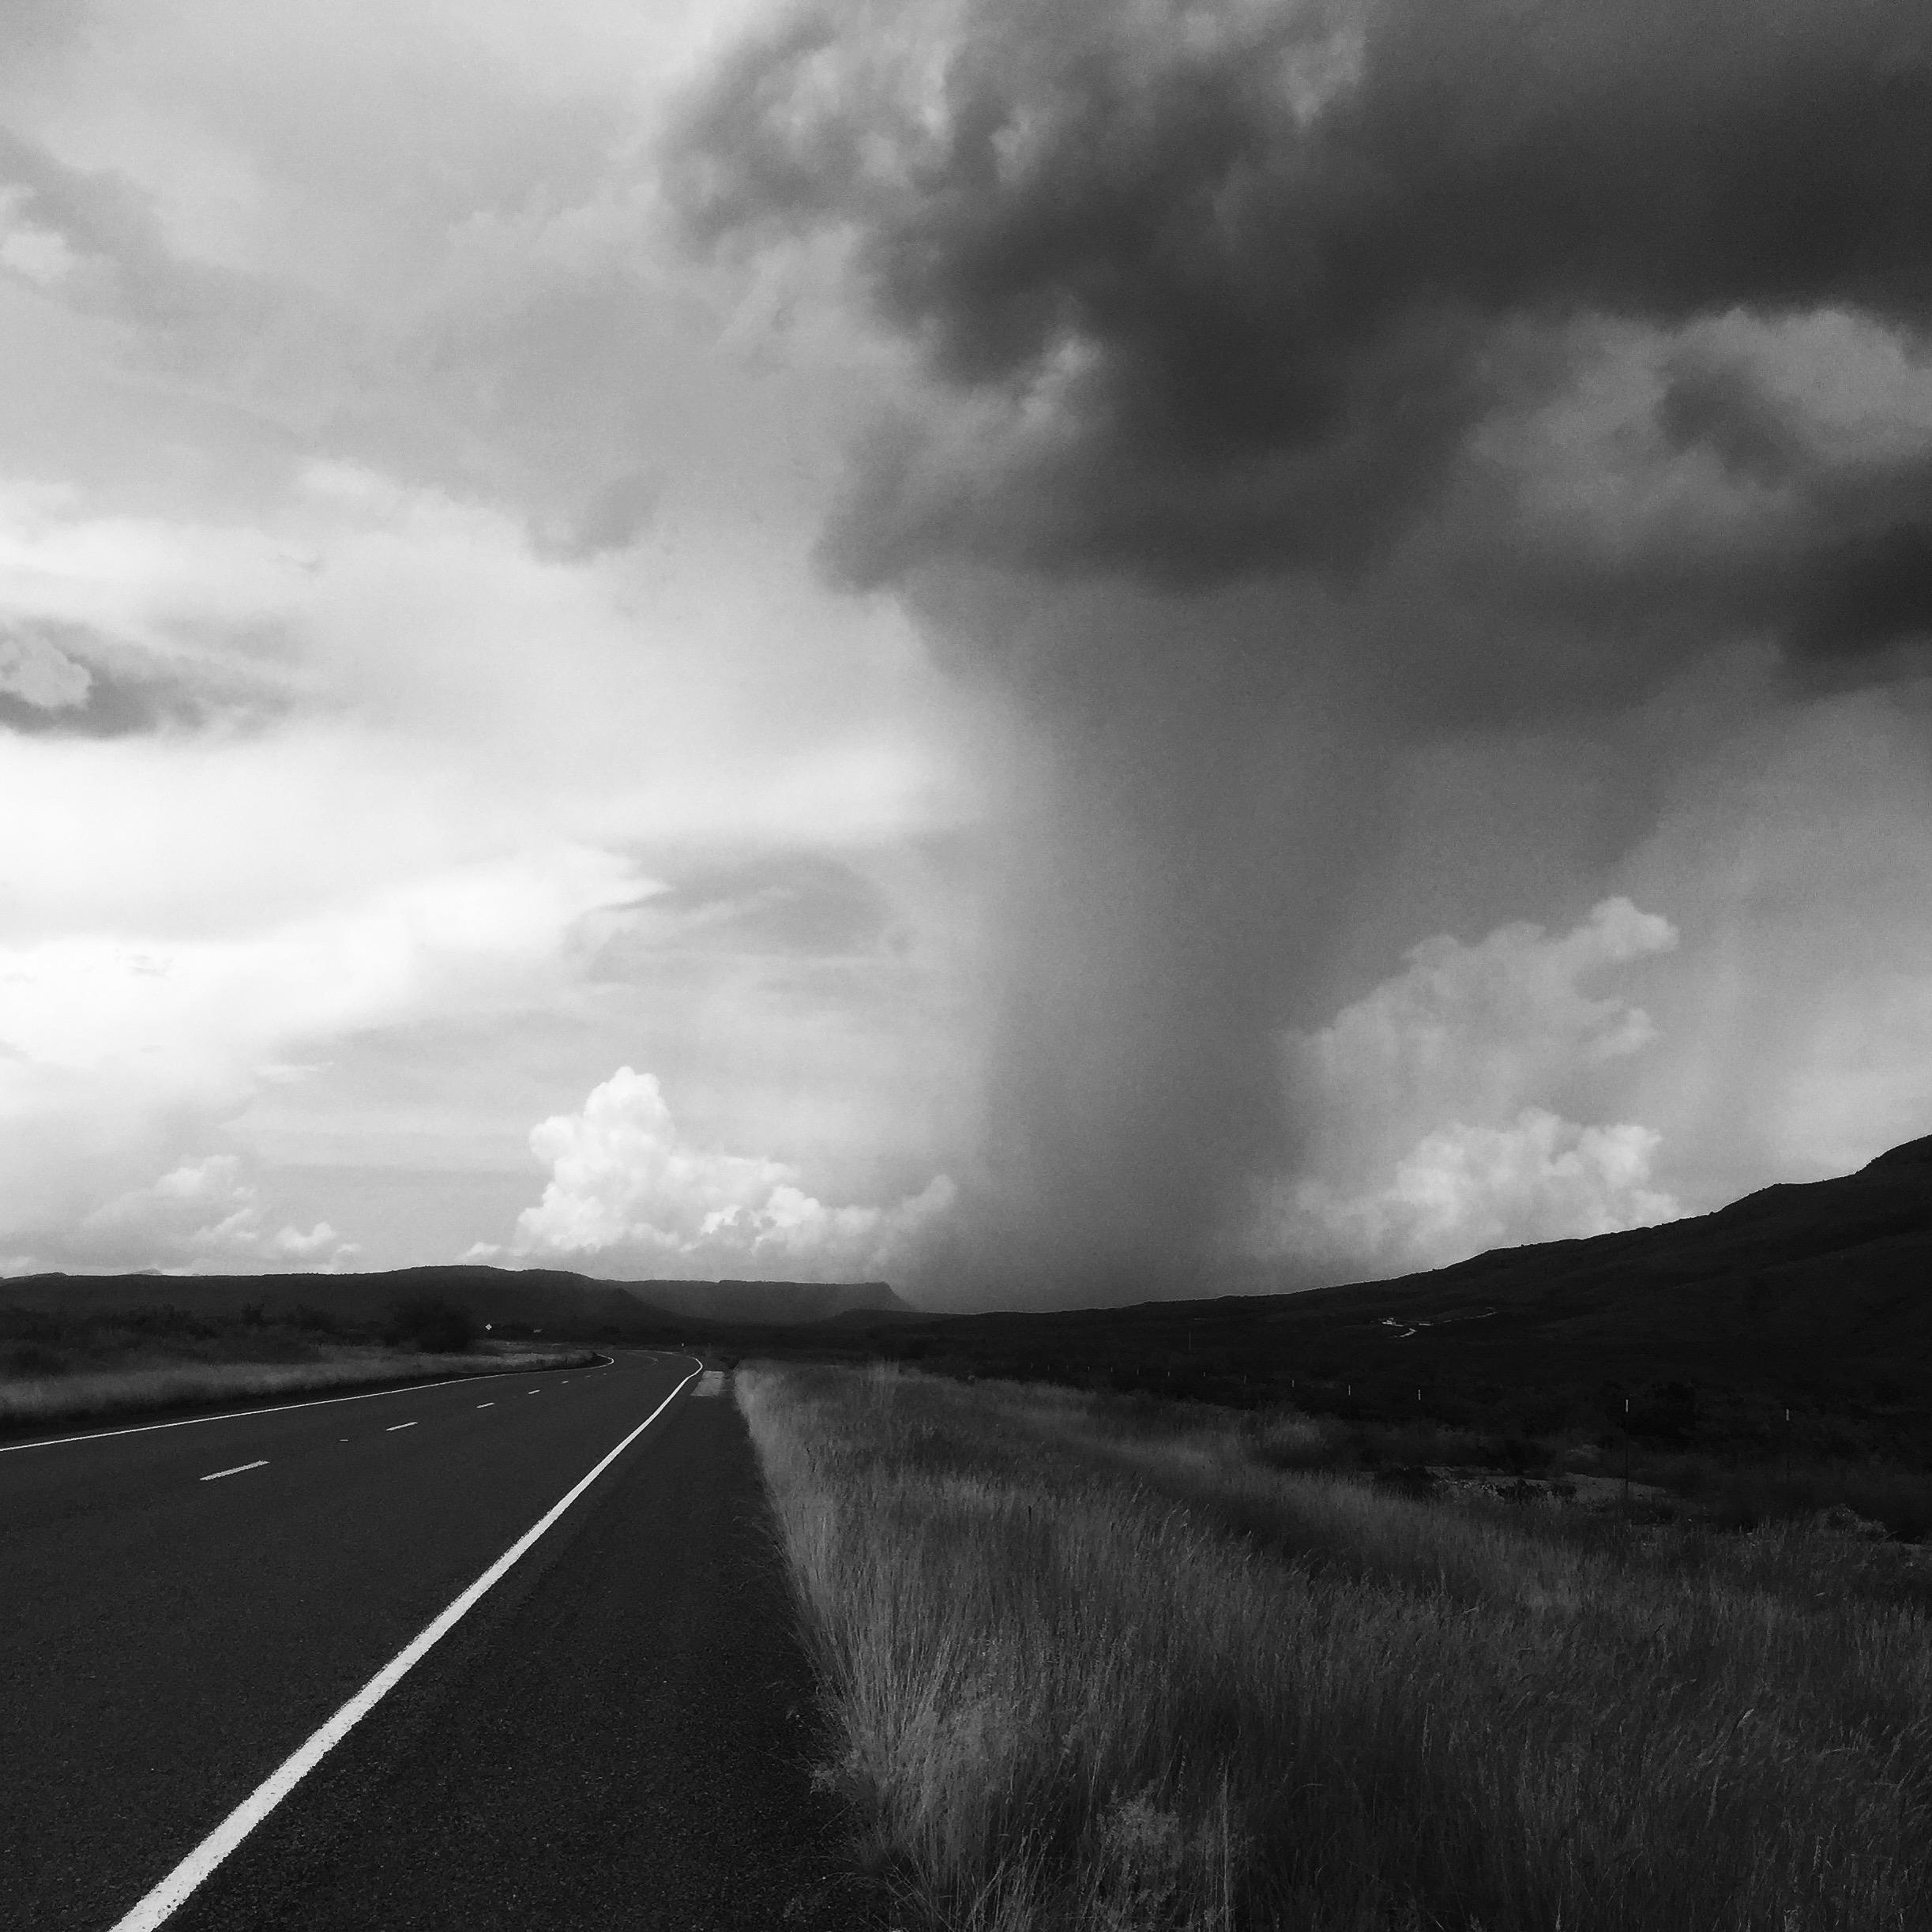 A storm rolls past us on the trip. (Source: Jonathon M. Seidl)